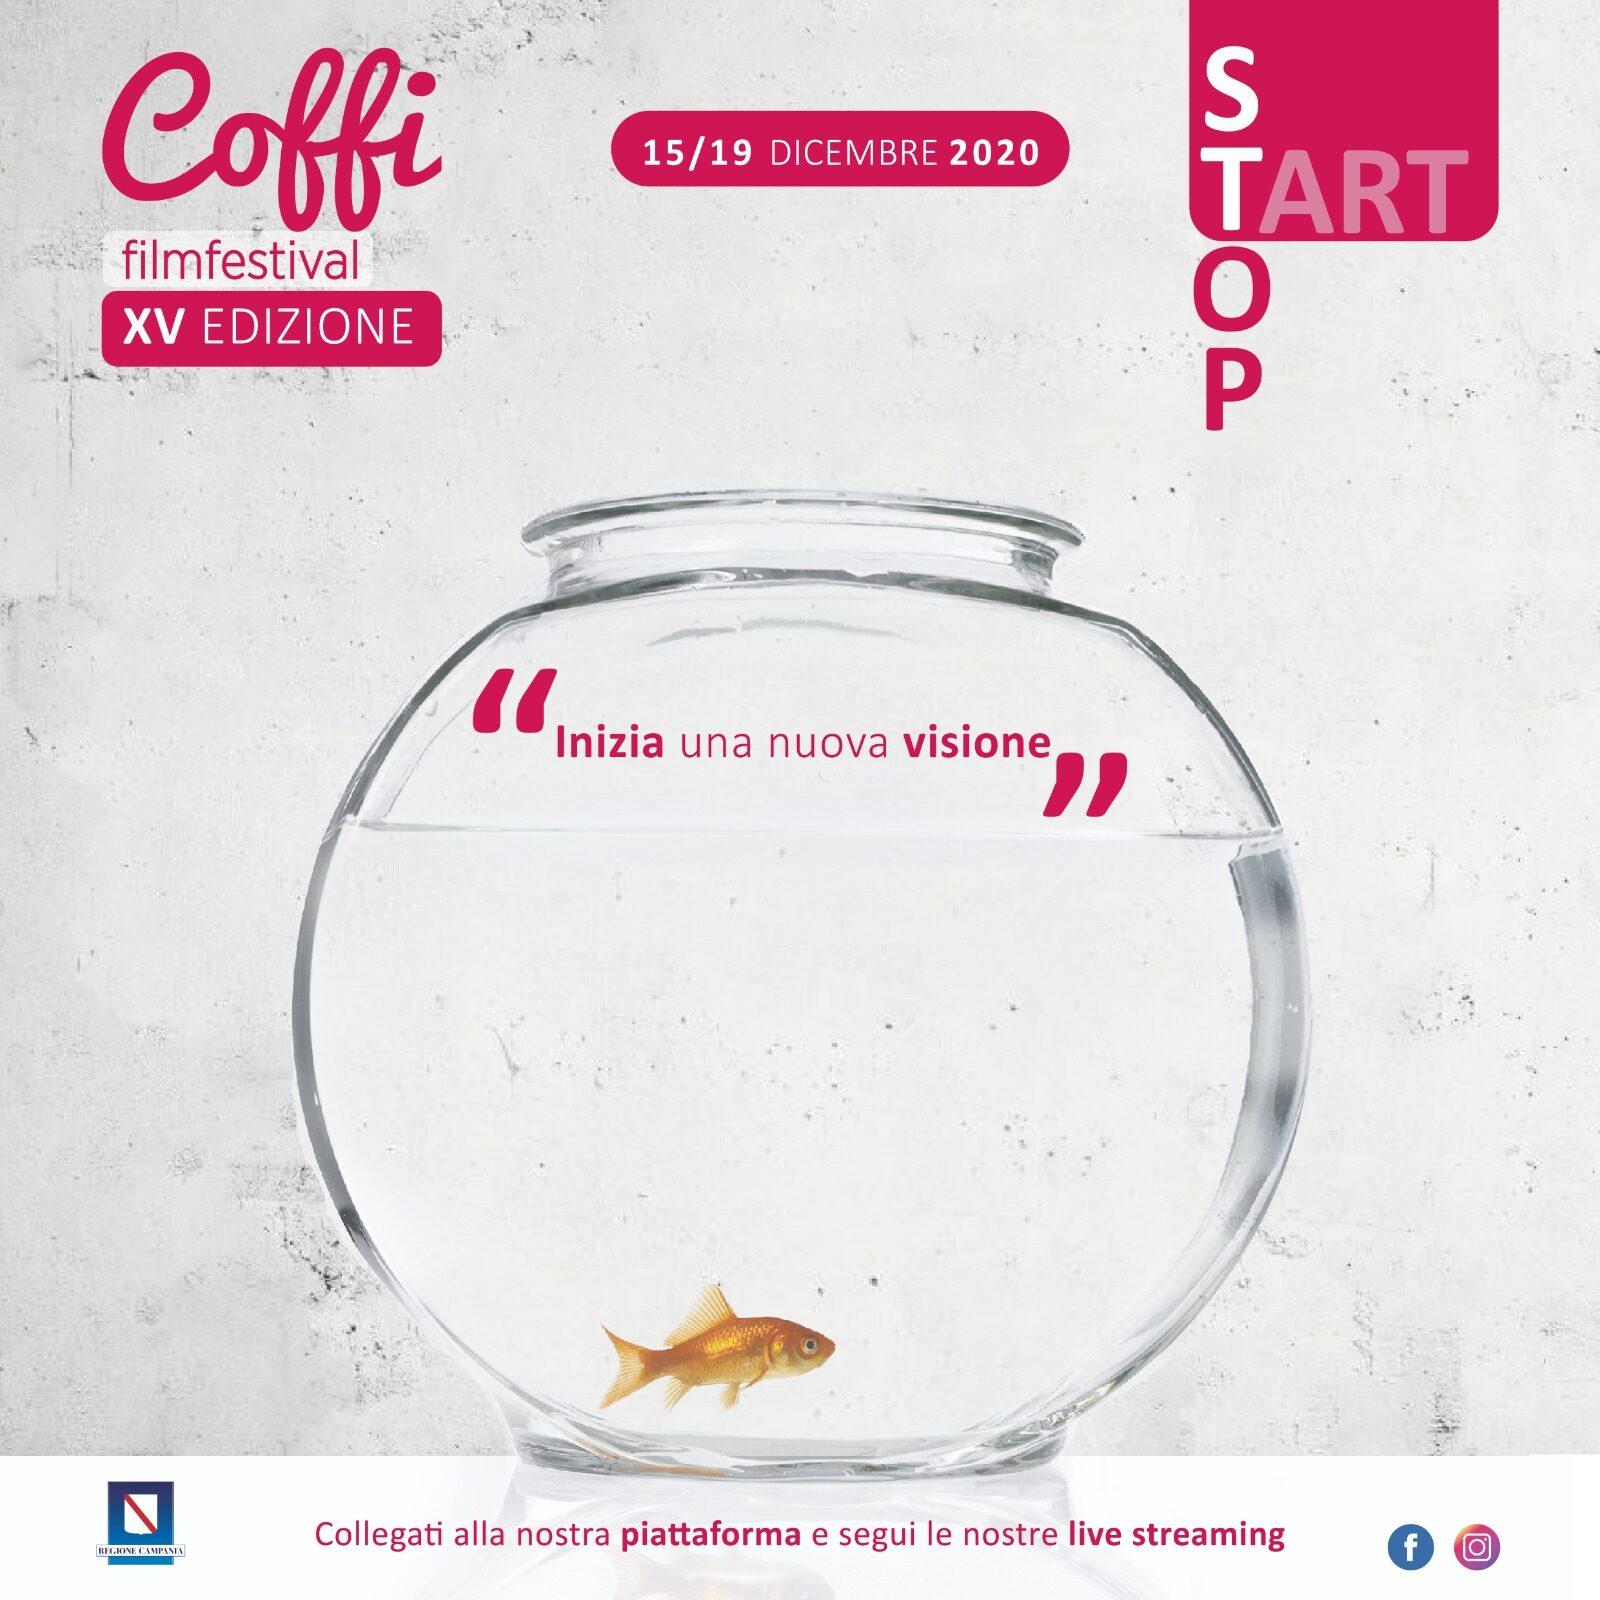 COFFI FilmFestival 2020